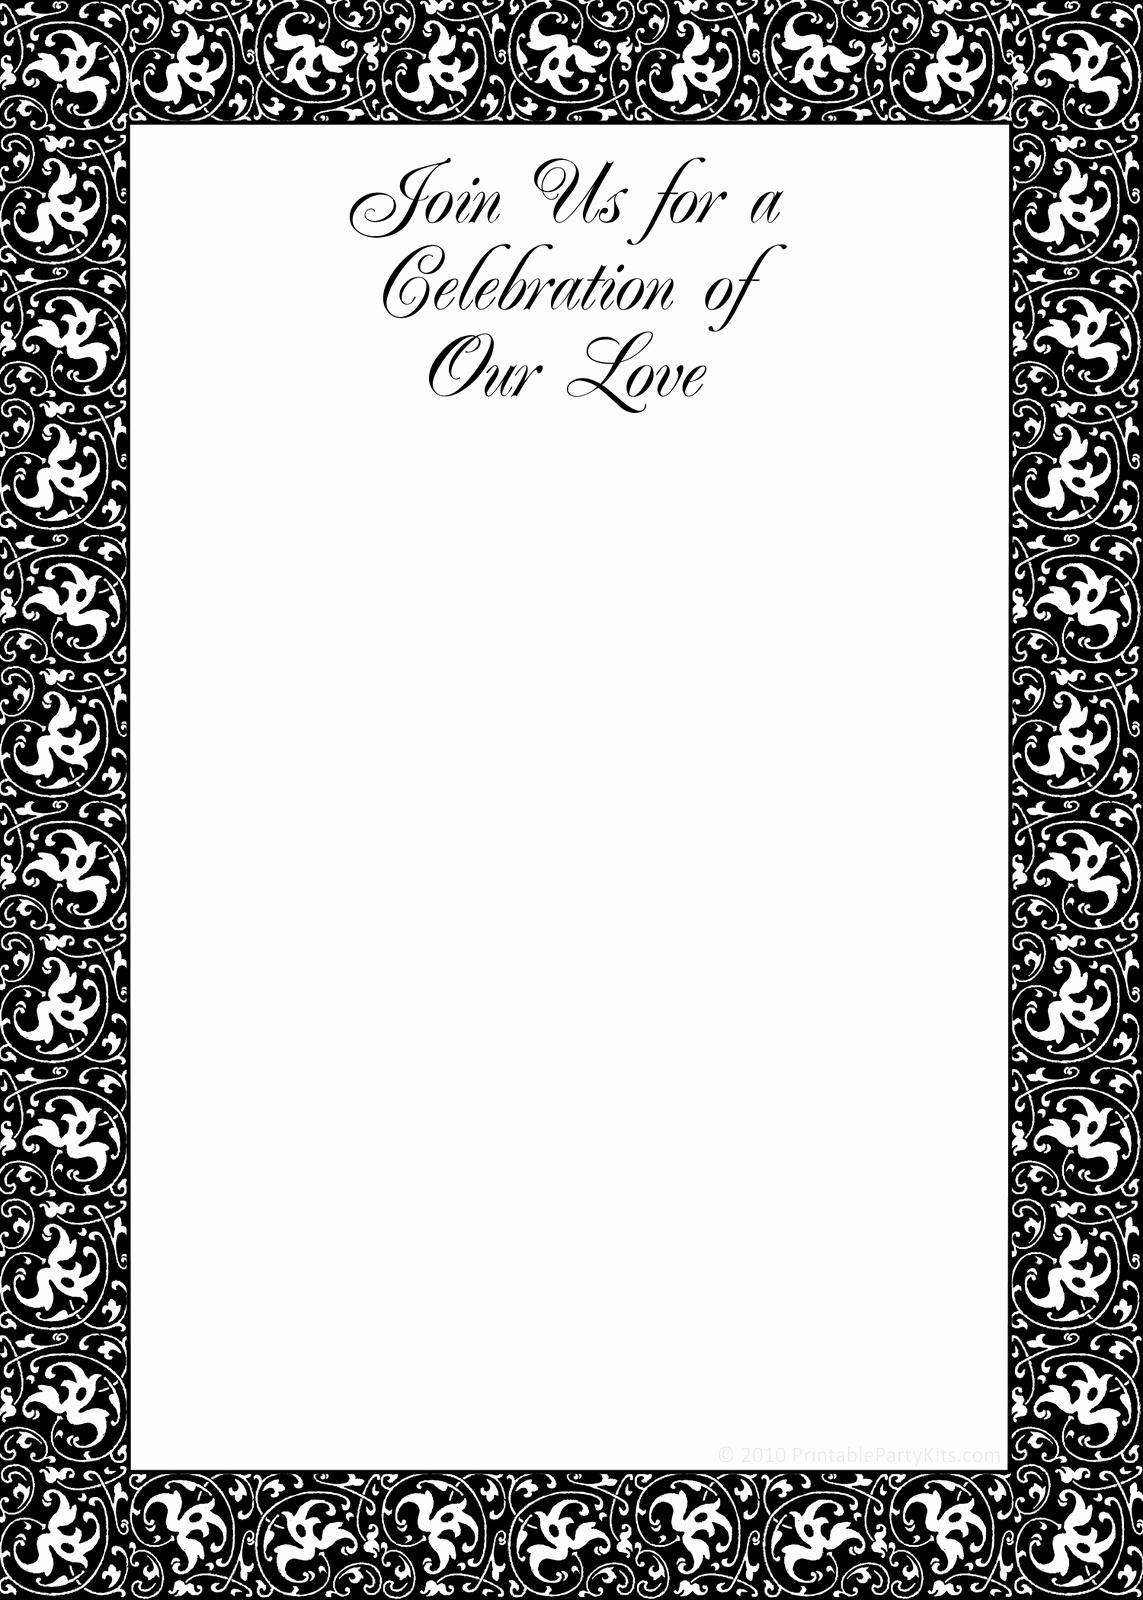 Black and White Birthday Invitations Inspirational Free Printable Black and White Birthday Invitation